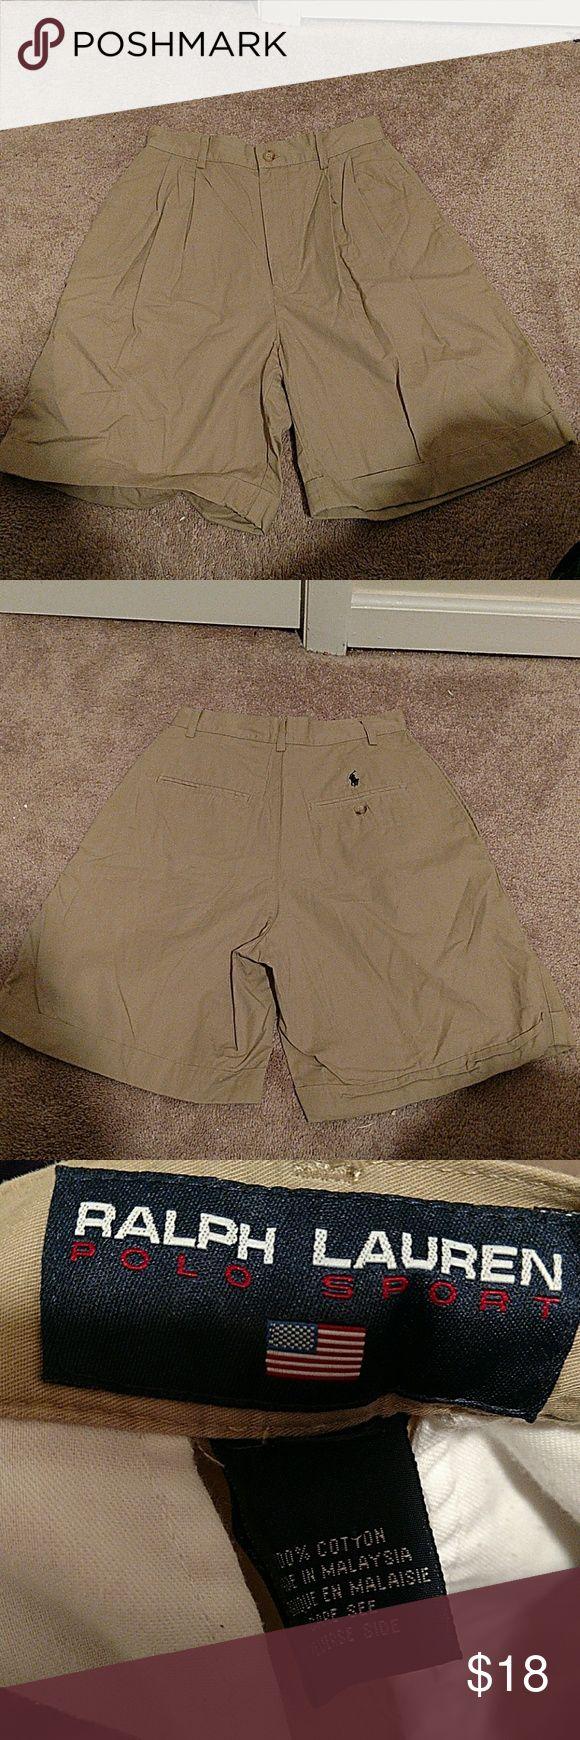 Ralph Lauren Polo khaki shorts Classic pair of Ralph Lauren Polo shorts. Great kakhi color that goes well with everything! 10 percent cotton Ralph Lauren Shorts